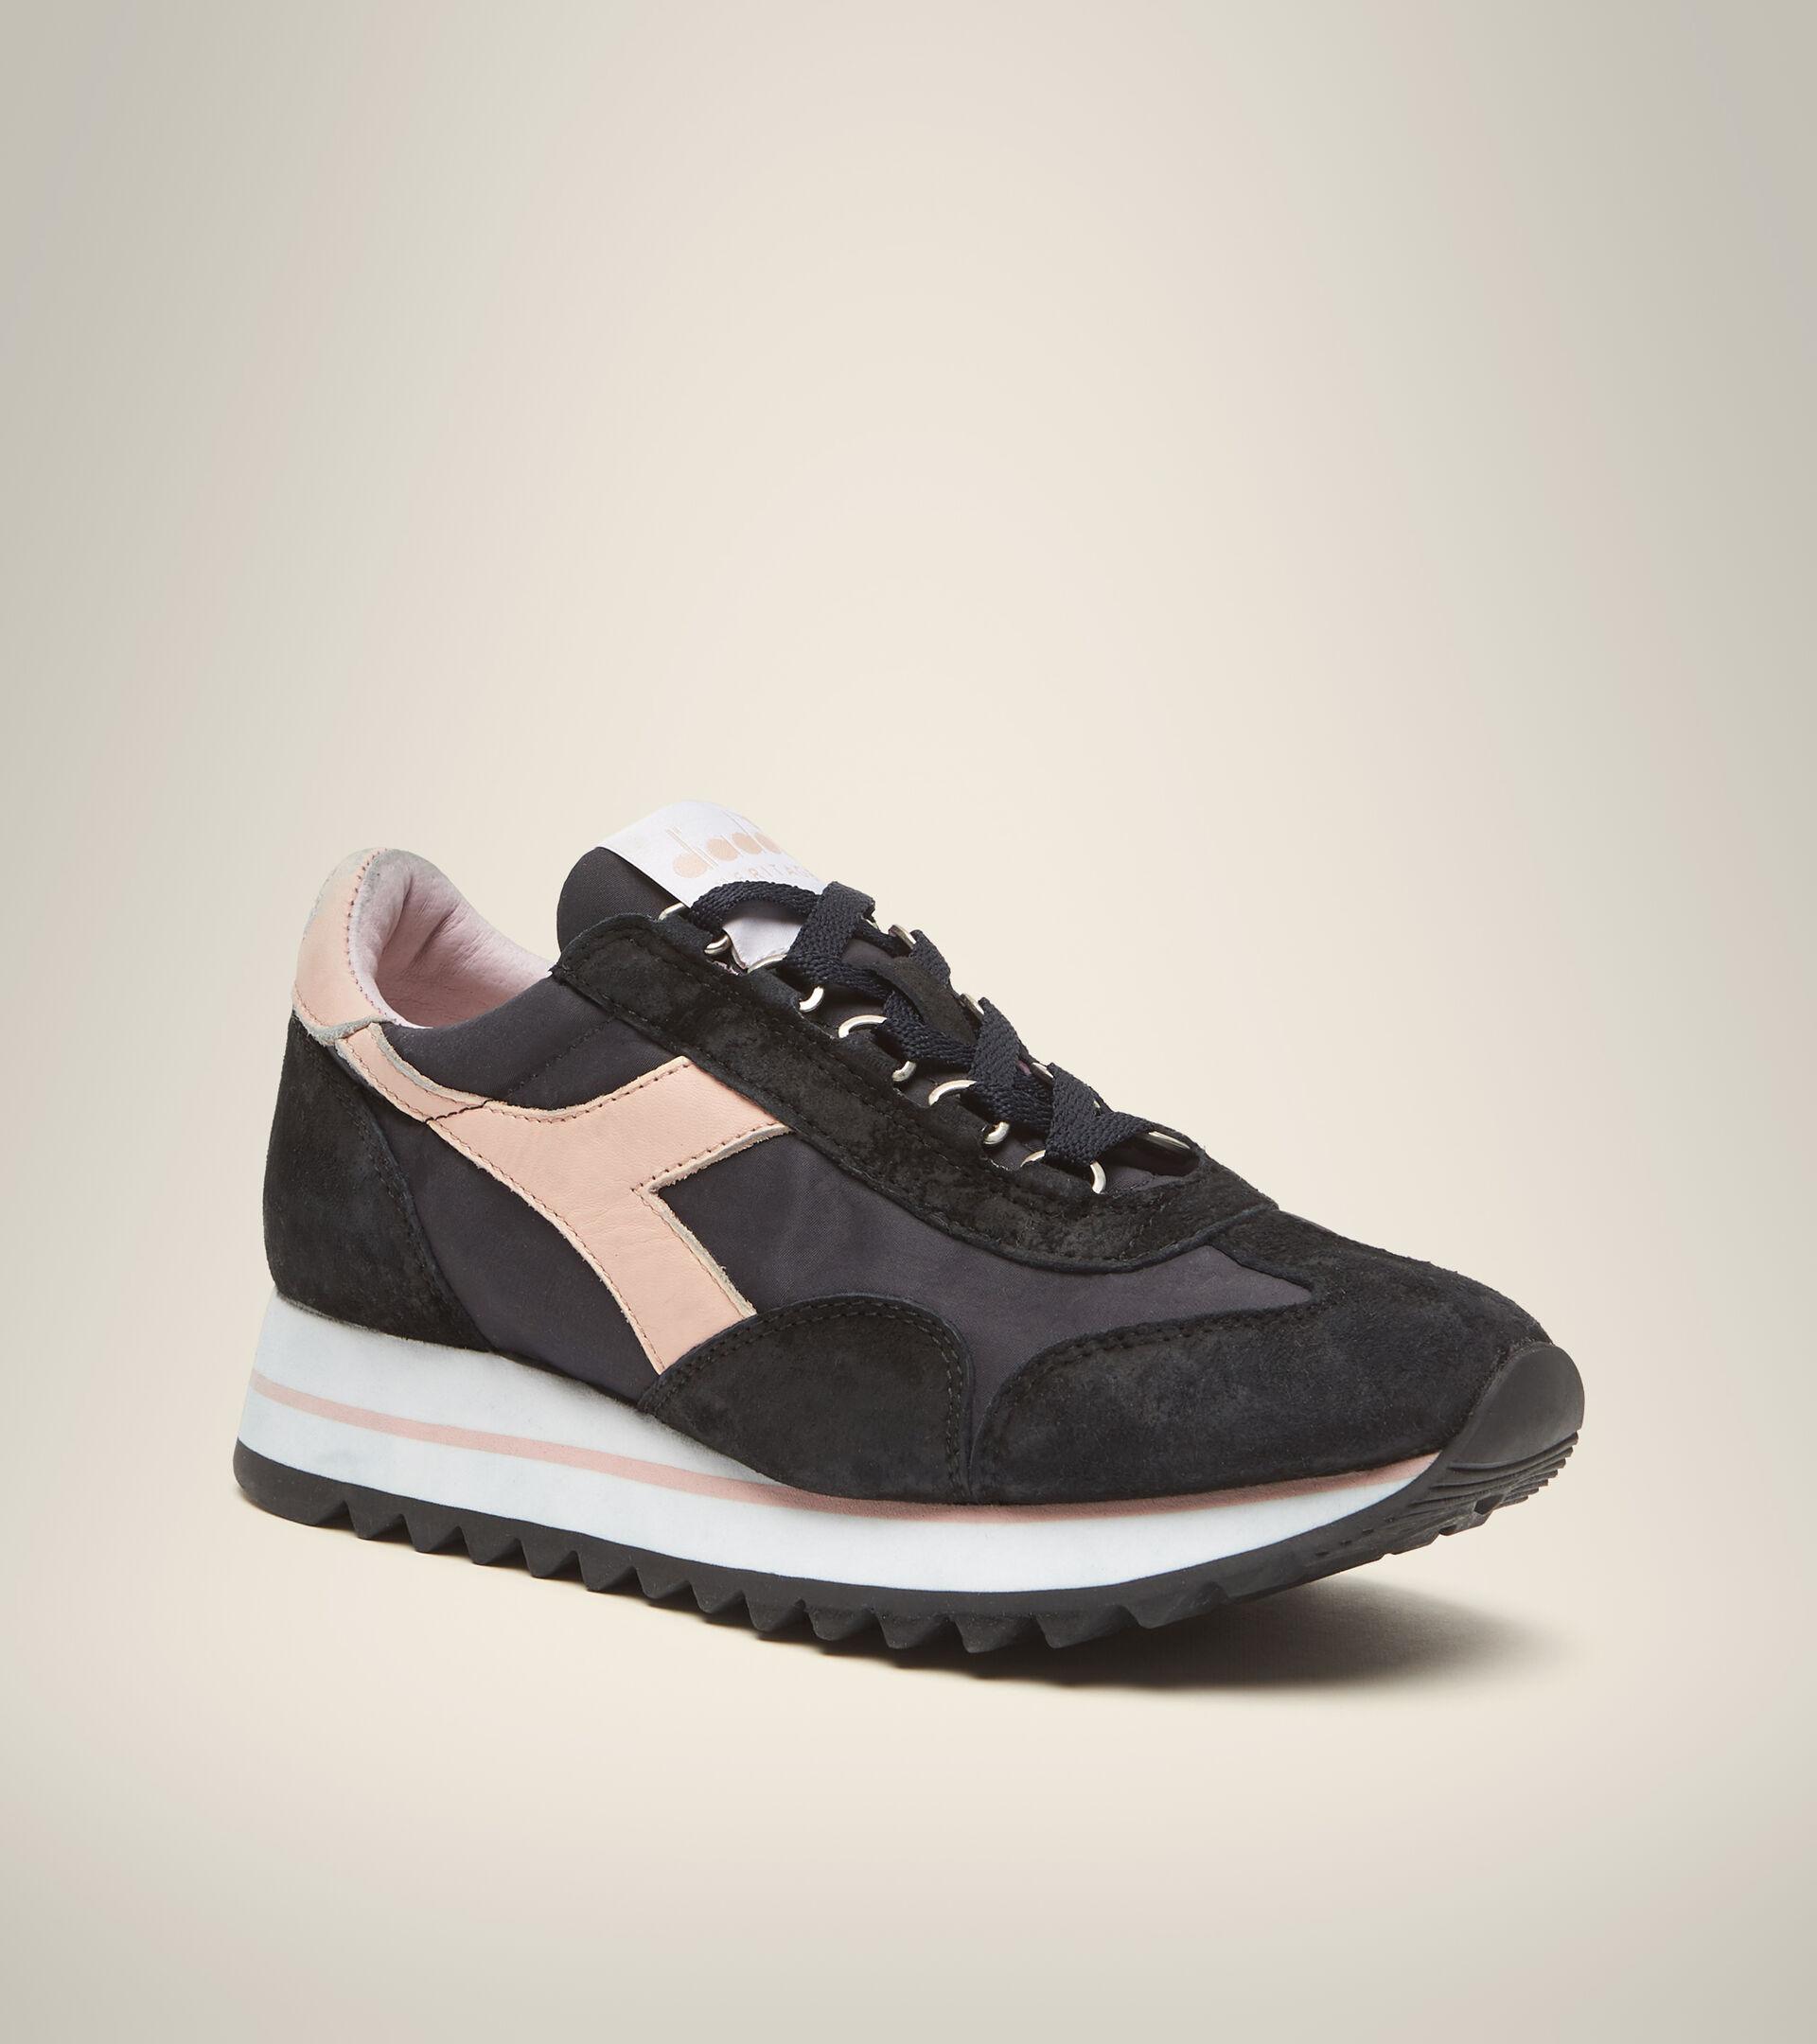 Footwear Heritage DONNA EQUIPE SUEDE SW EVO WN AZUL MARINO OSCURO Diadora